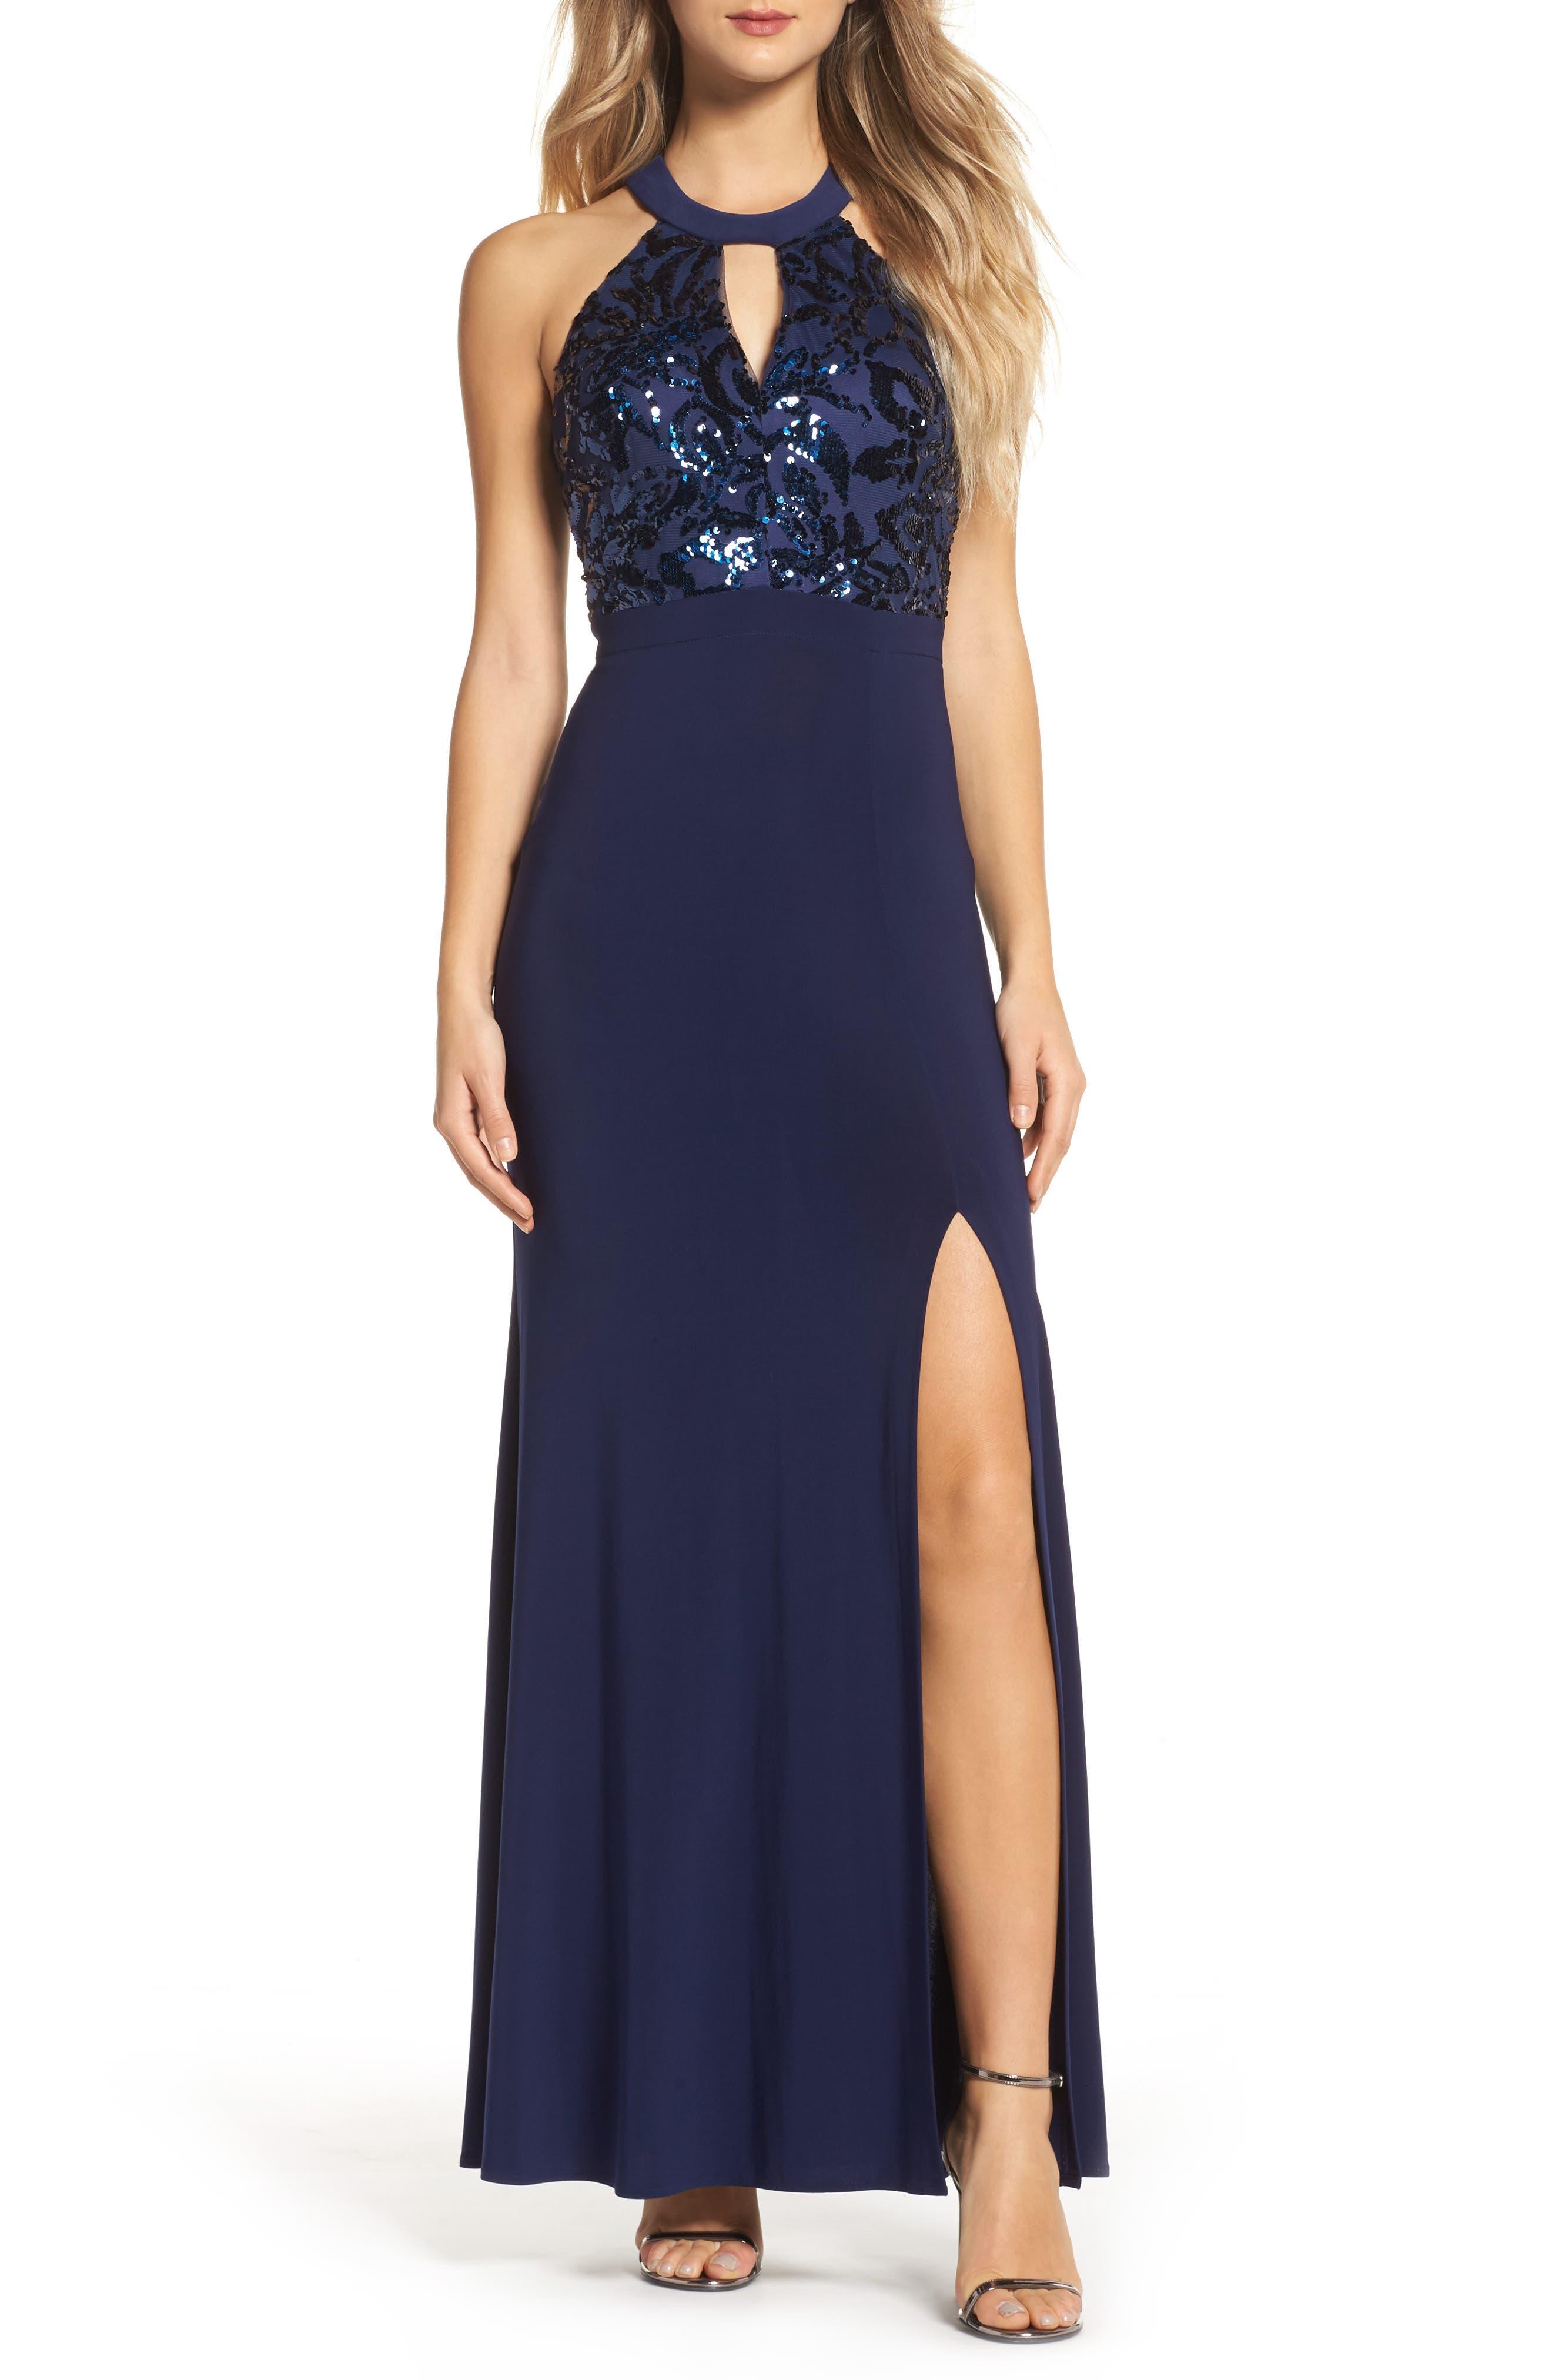 Morgan & Co. Sequin Halter Neck Gown